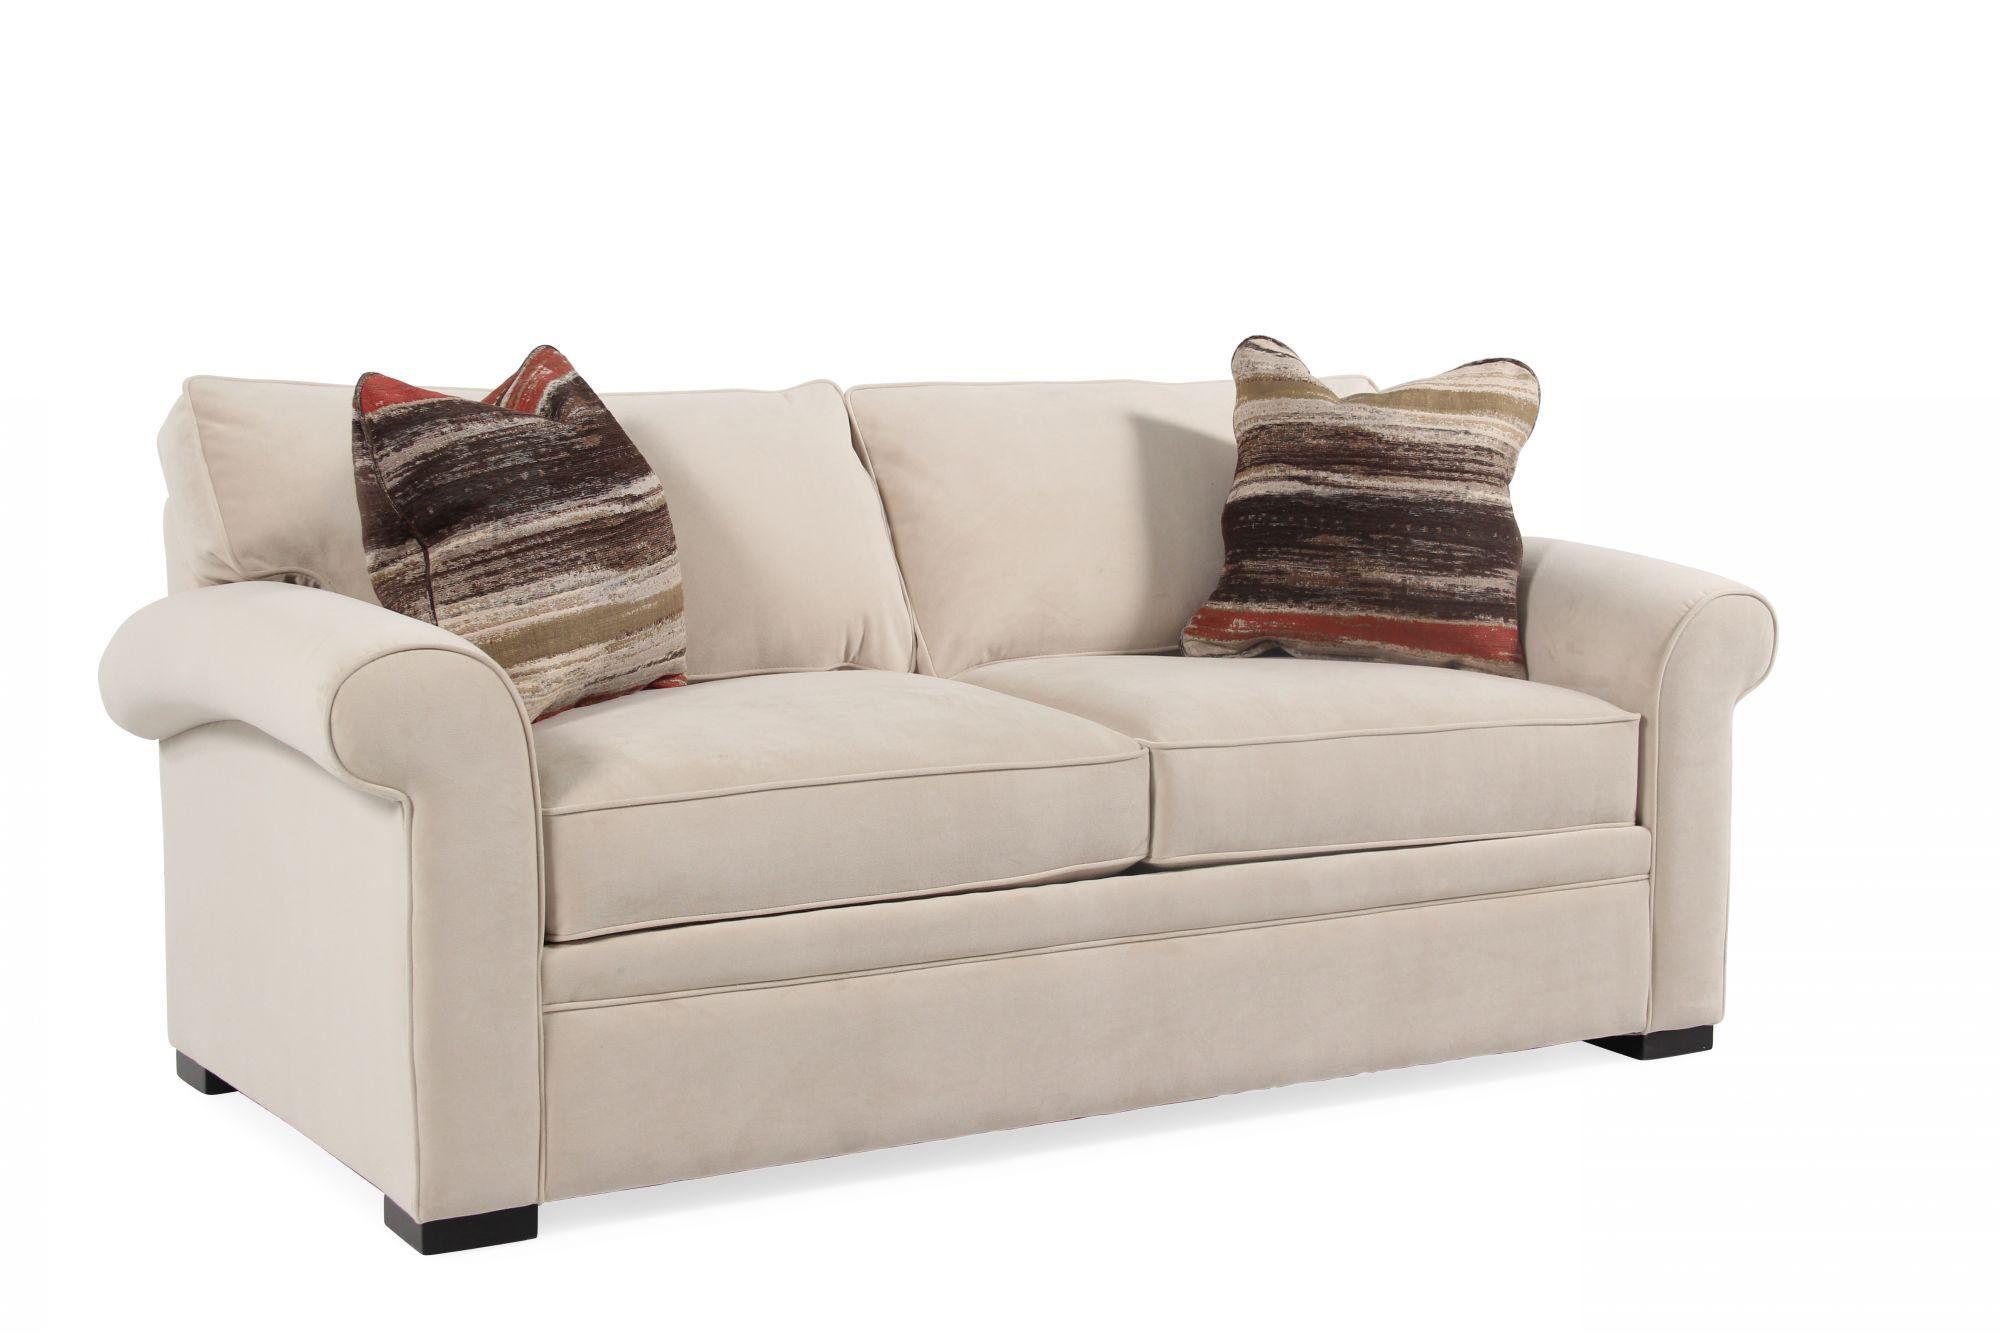 jonathan louis sofa bed simple foam memory buck twin sleeper mathis